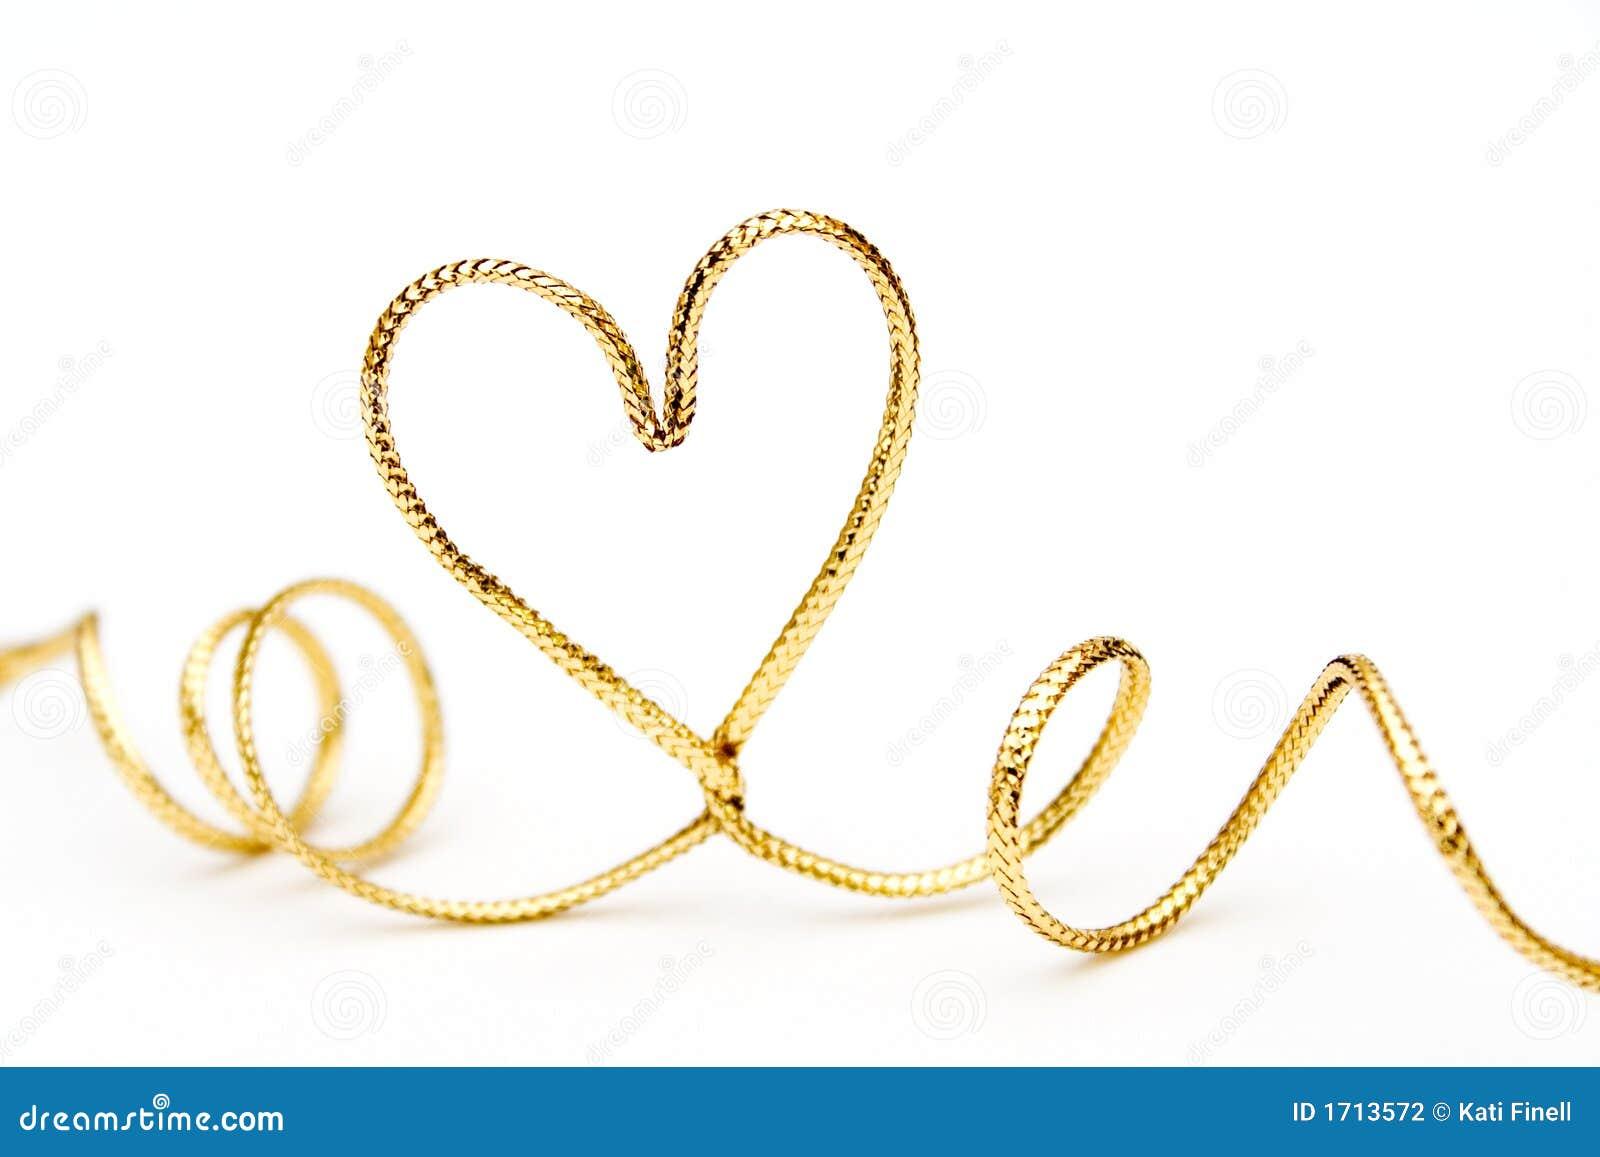 Golden heart stock photo. Image of gold, romance ...